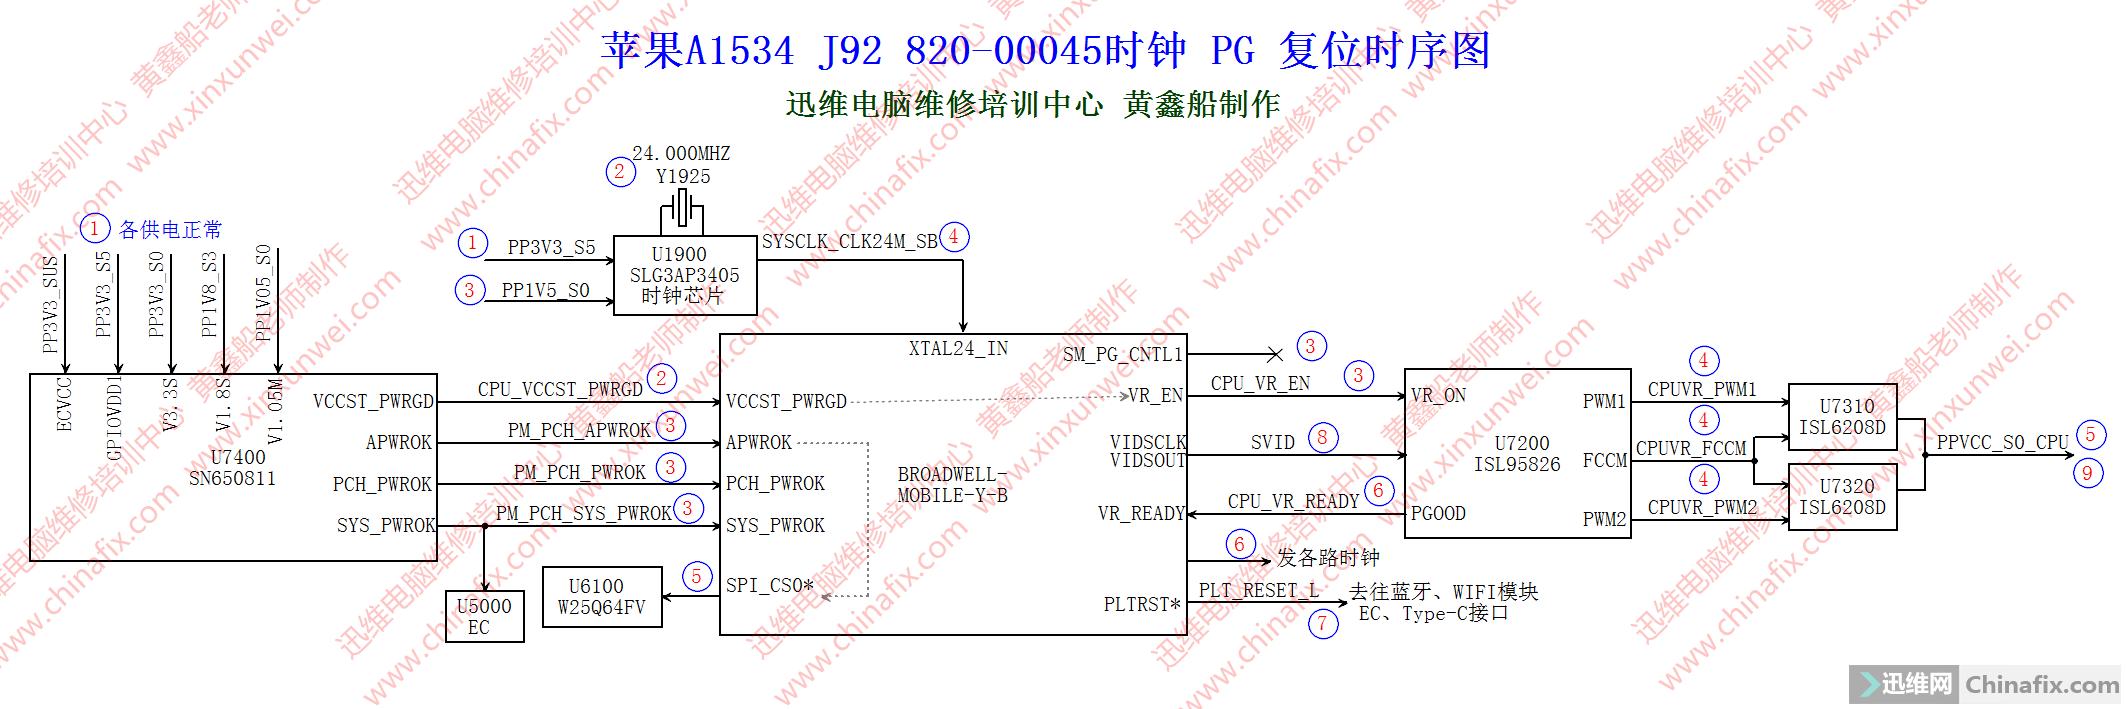 A1534的PG 时钟 复位电路时序图副本.png